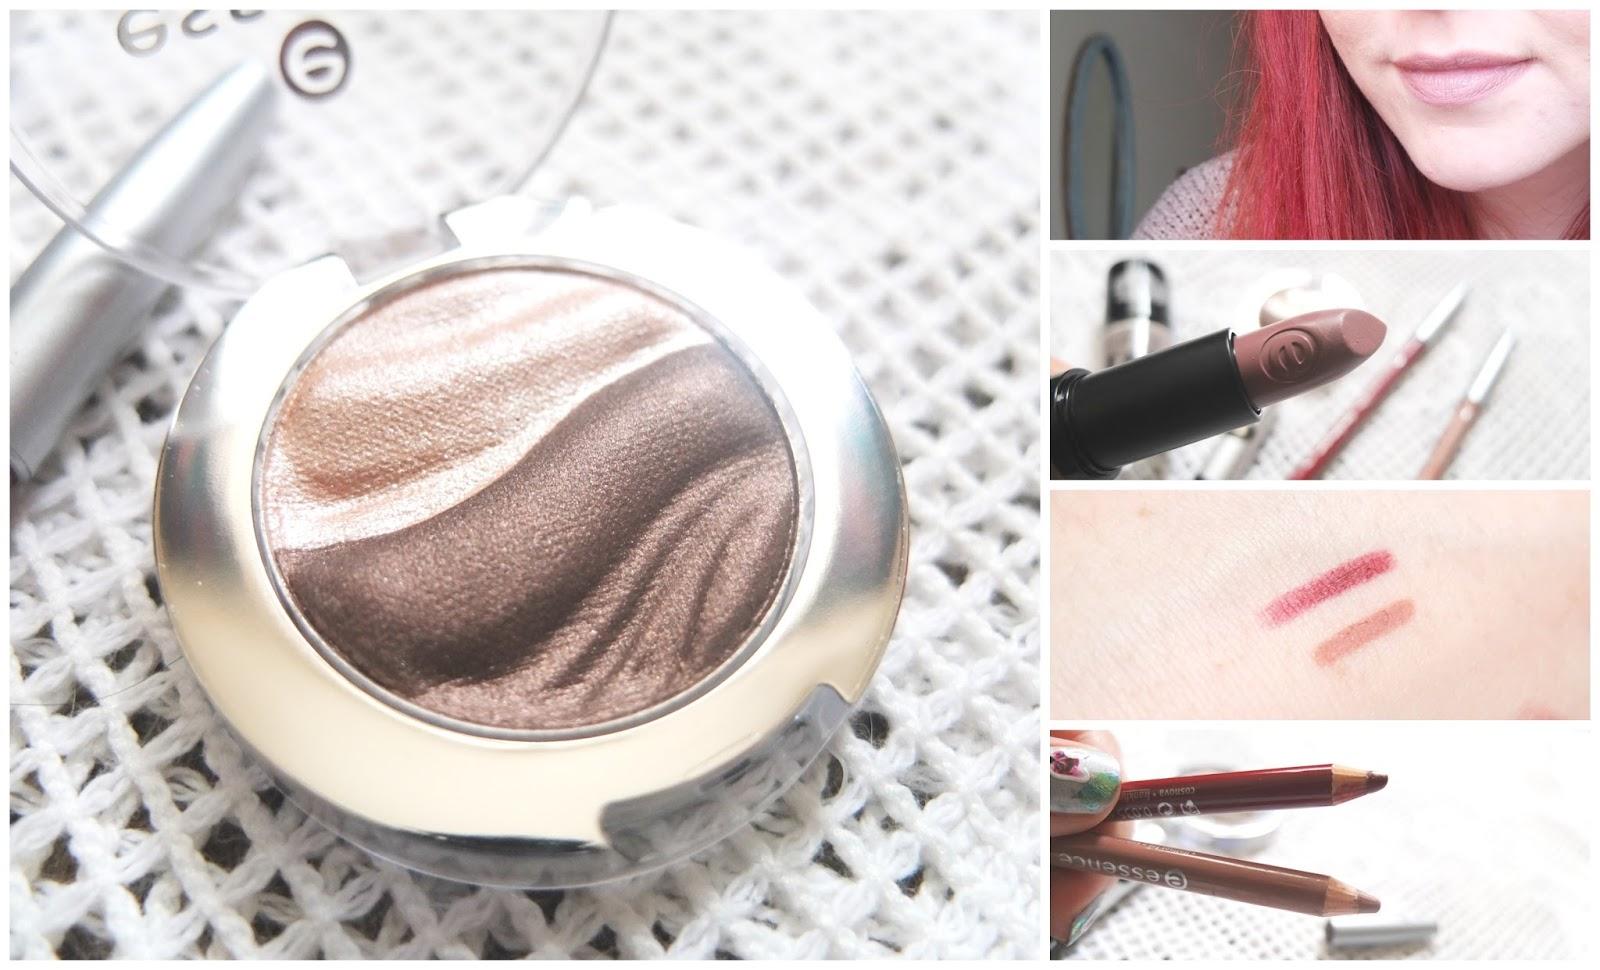 Essence Make Up: The Nudes